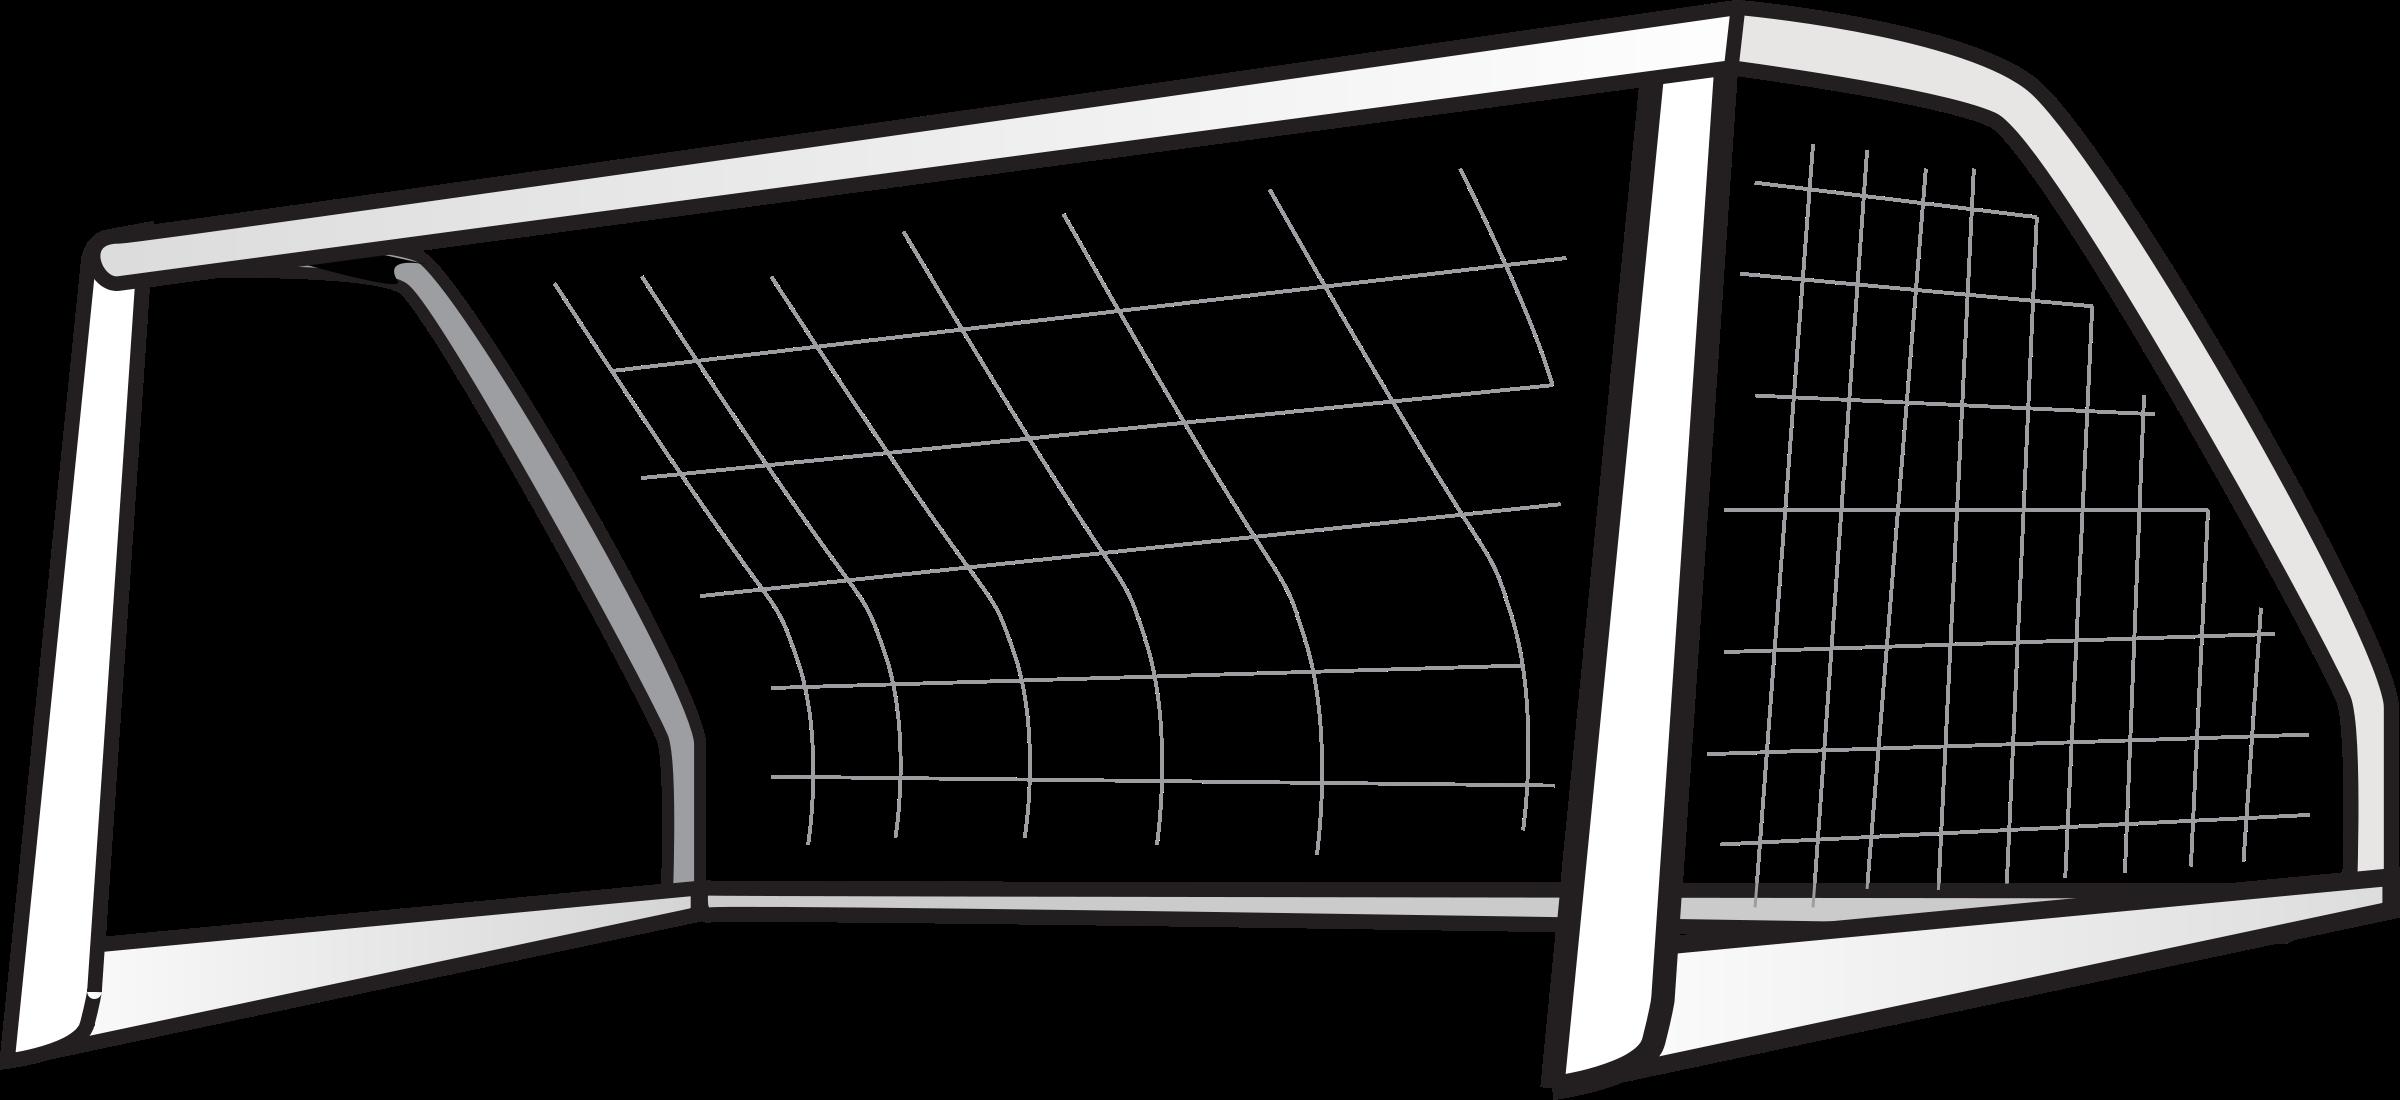 2400x1100 Soccer Goal Clipart